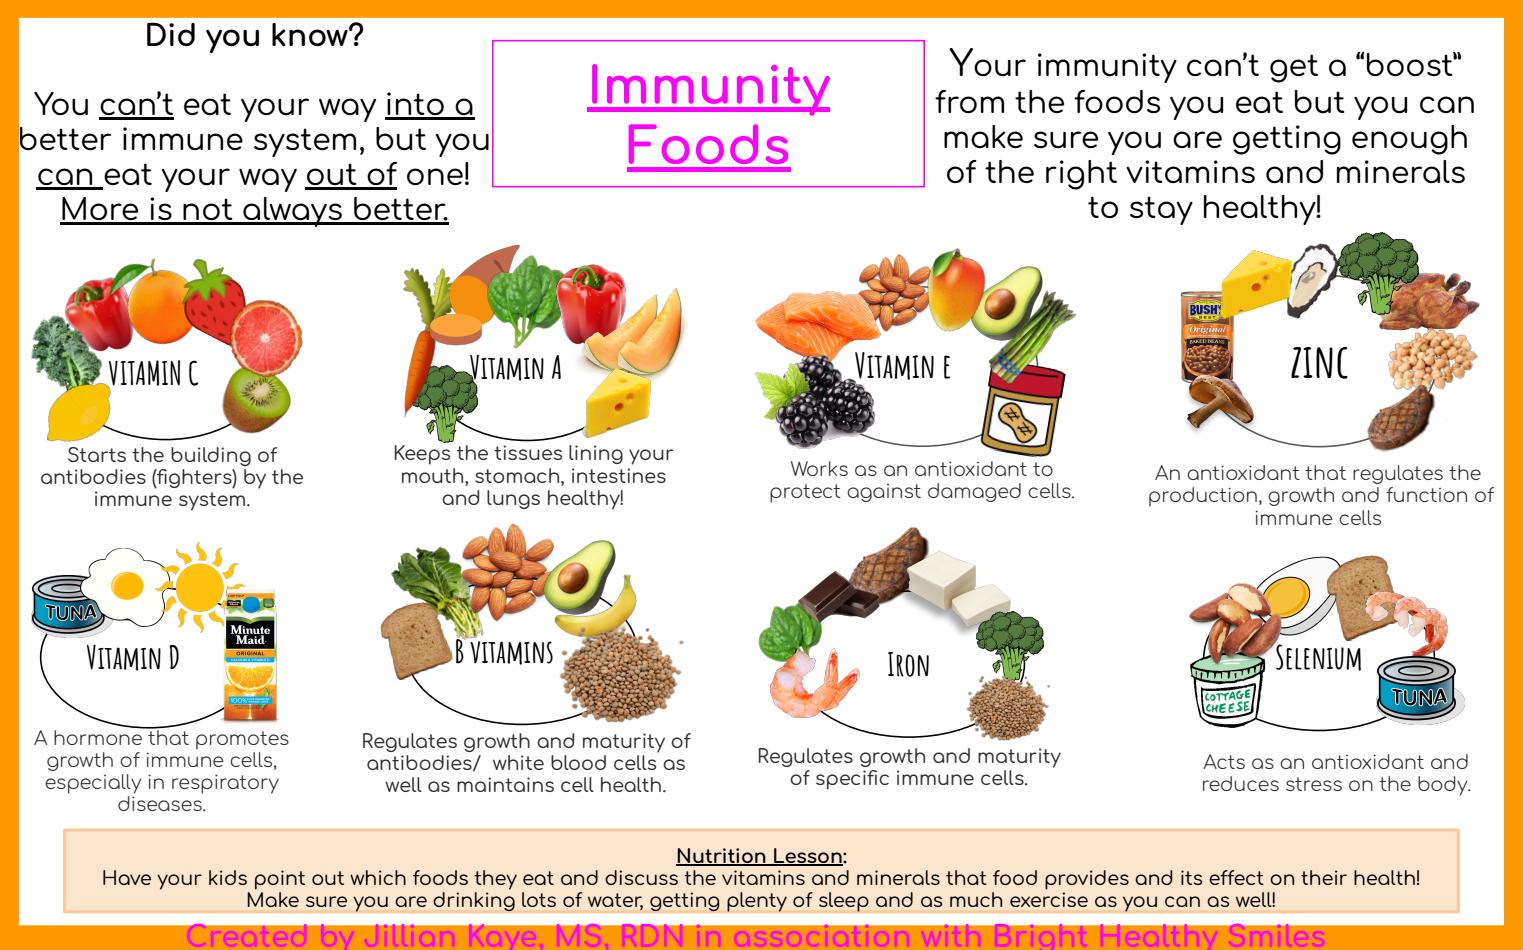 Immunity Foods